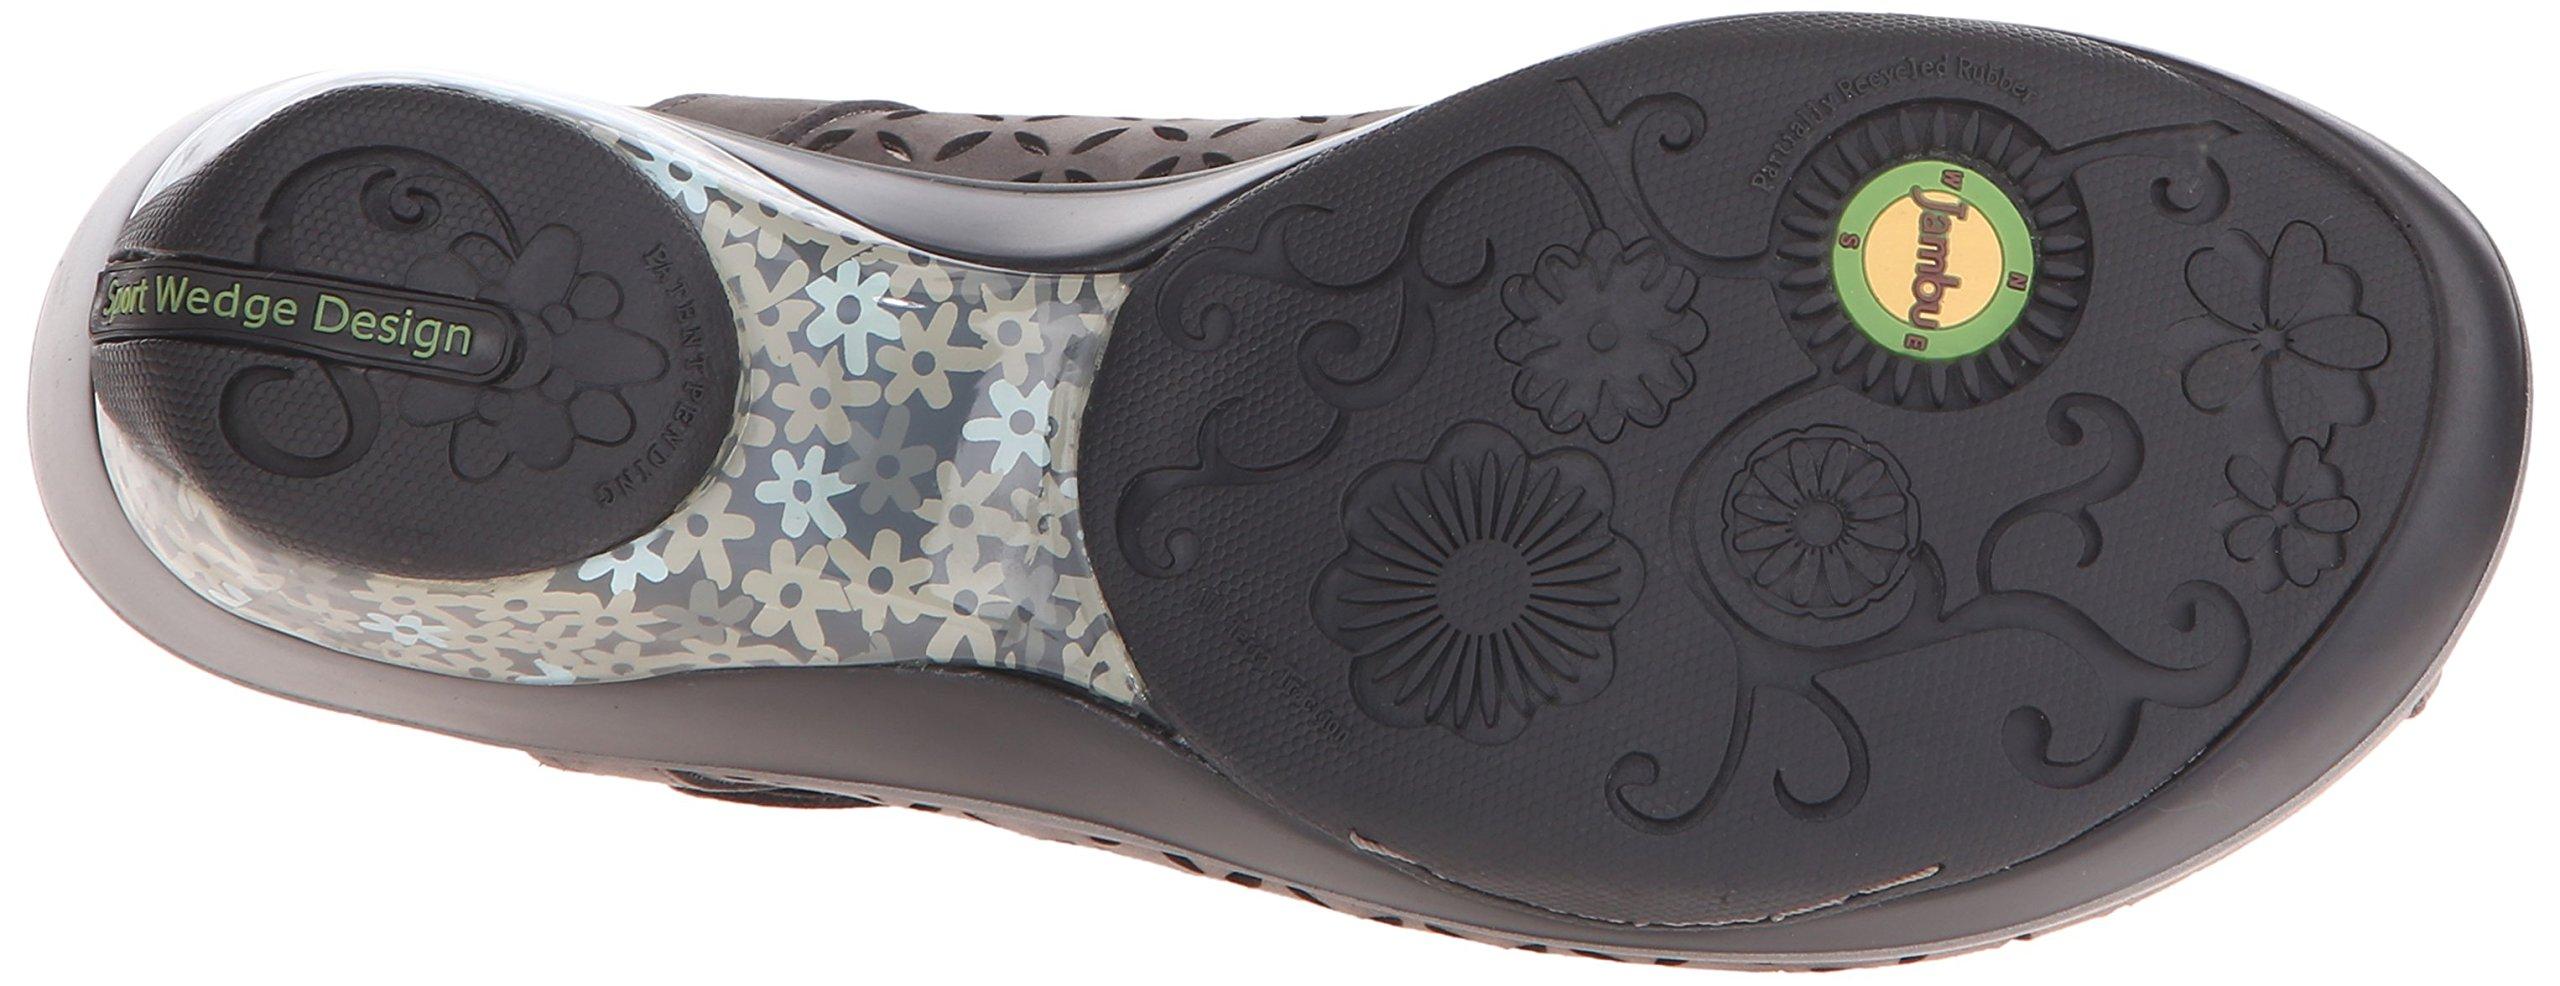 Jambu Women's Journey Encore Wedge Sandal, Dark Grey, 10 M US by Jambu (Image #3)